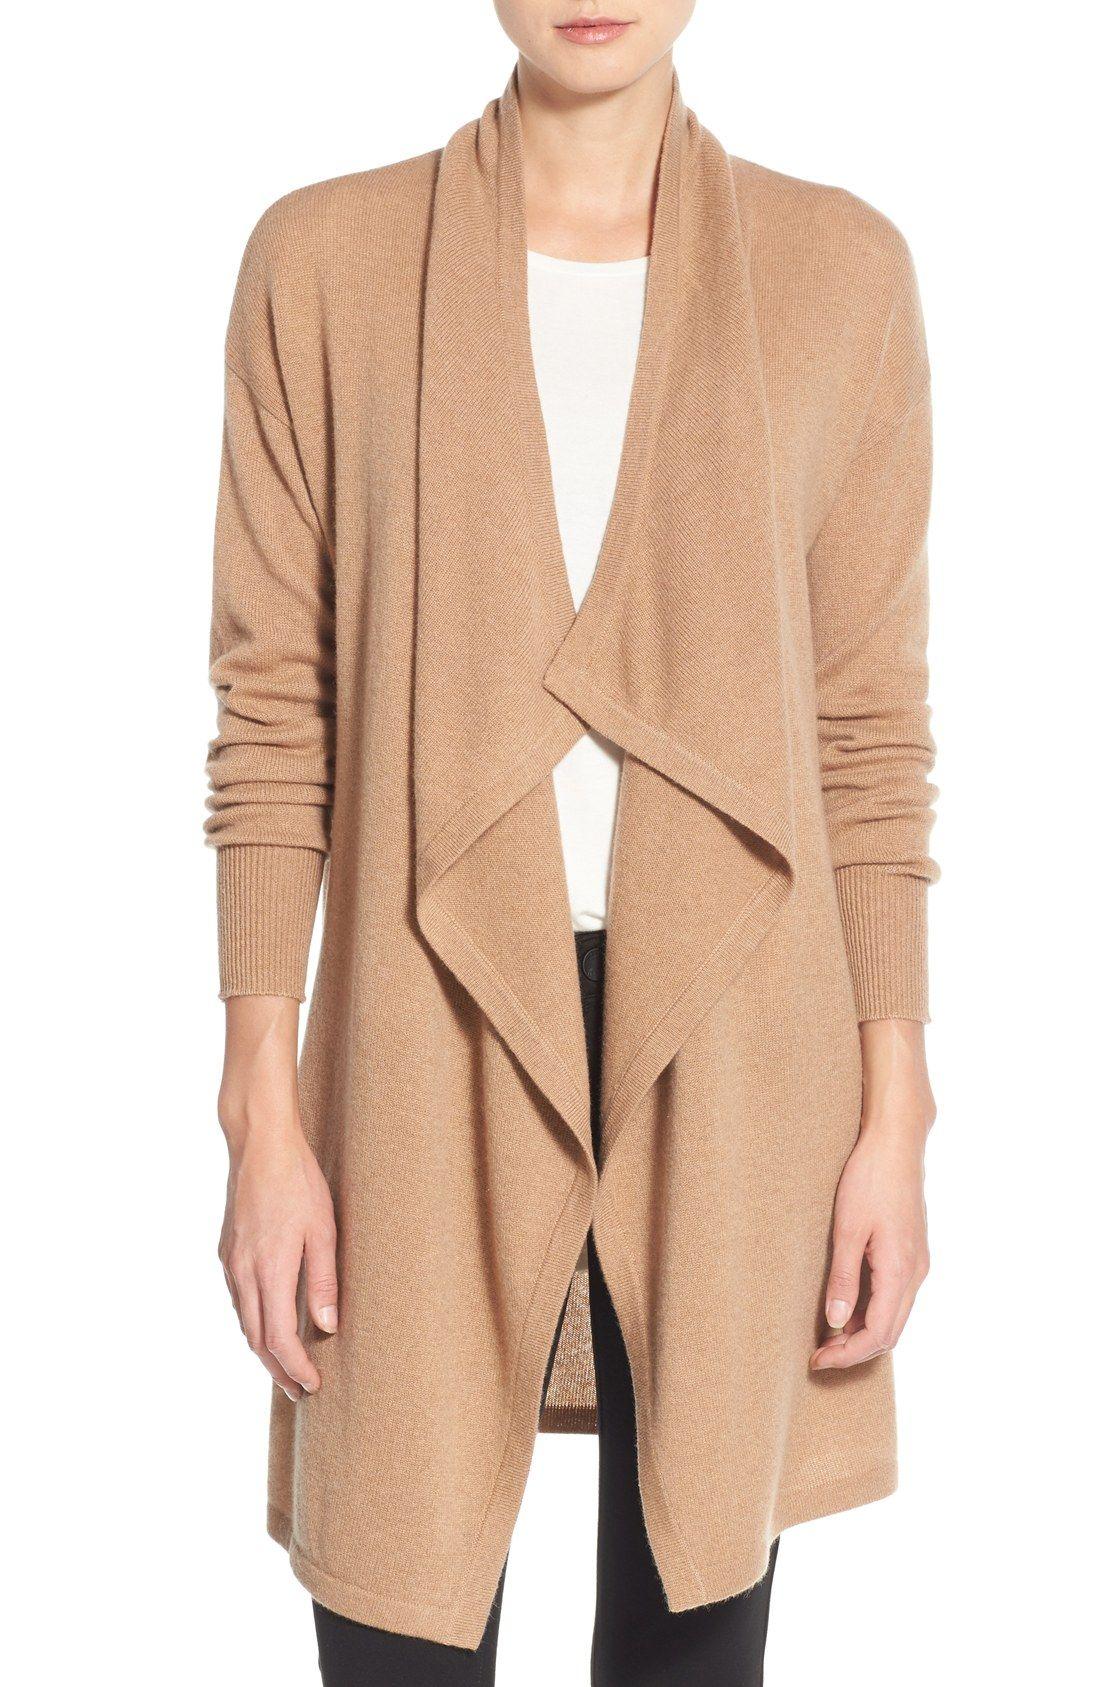 Nordstrom Anniversary Sale // Women's Picks | Utility jacket ...